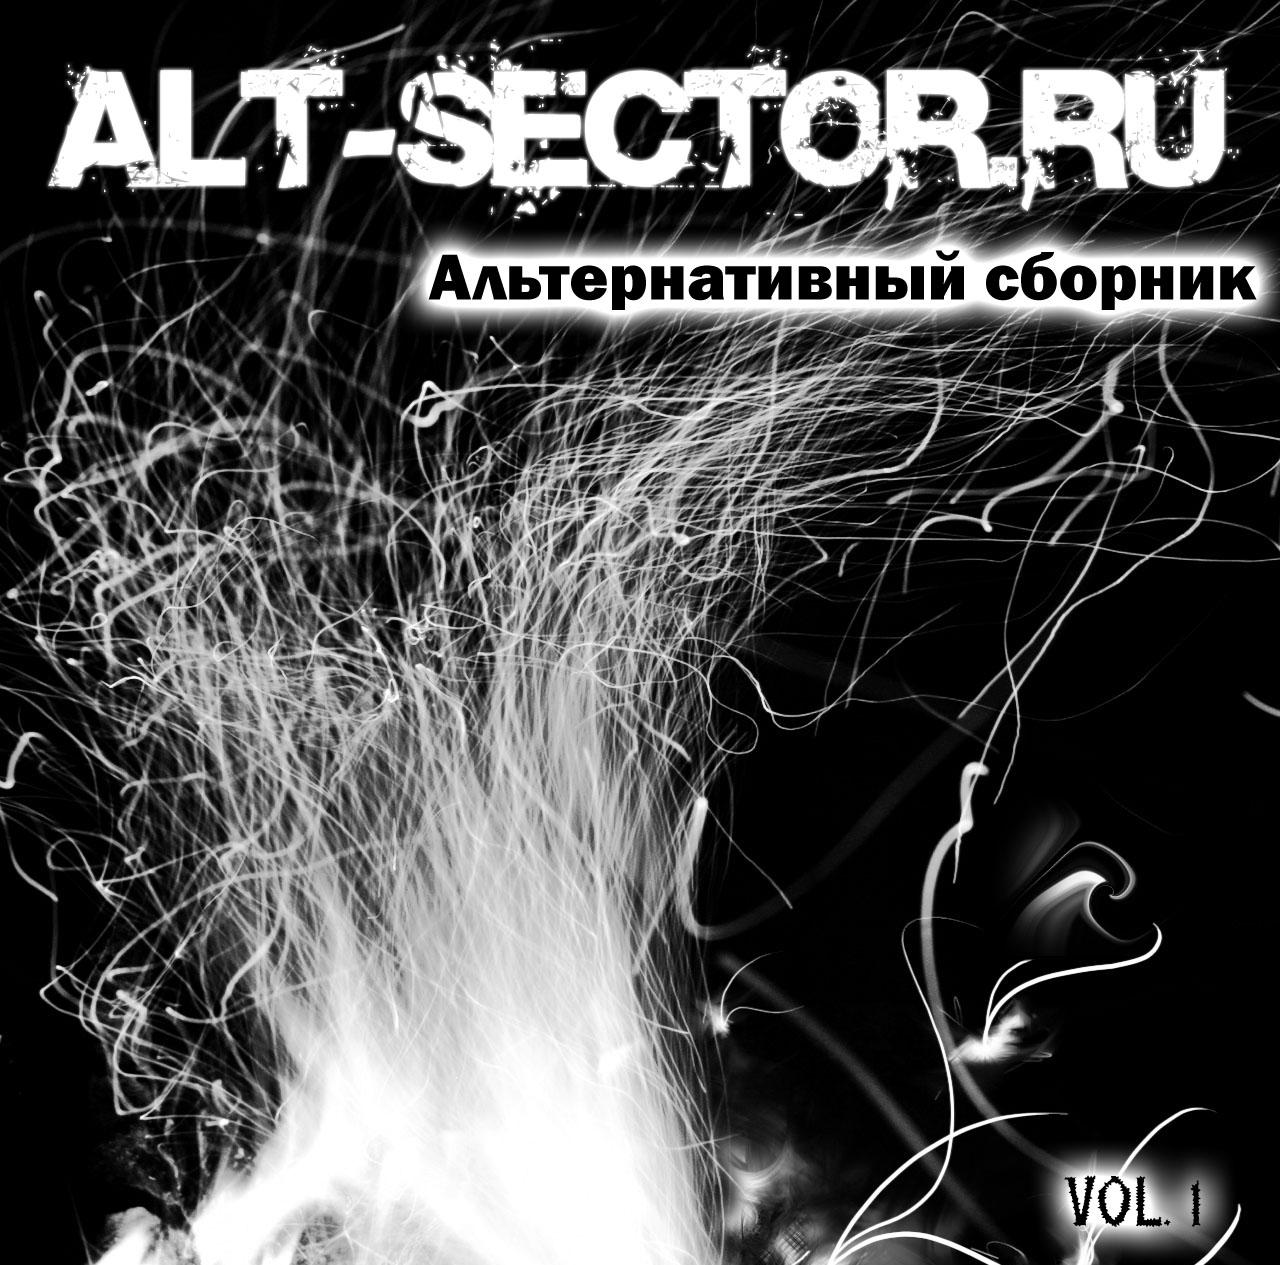 сборник 2011 года слушать онлайн